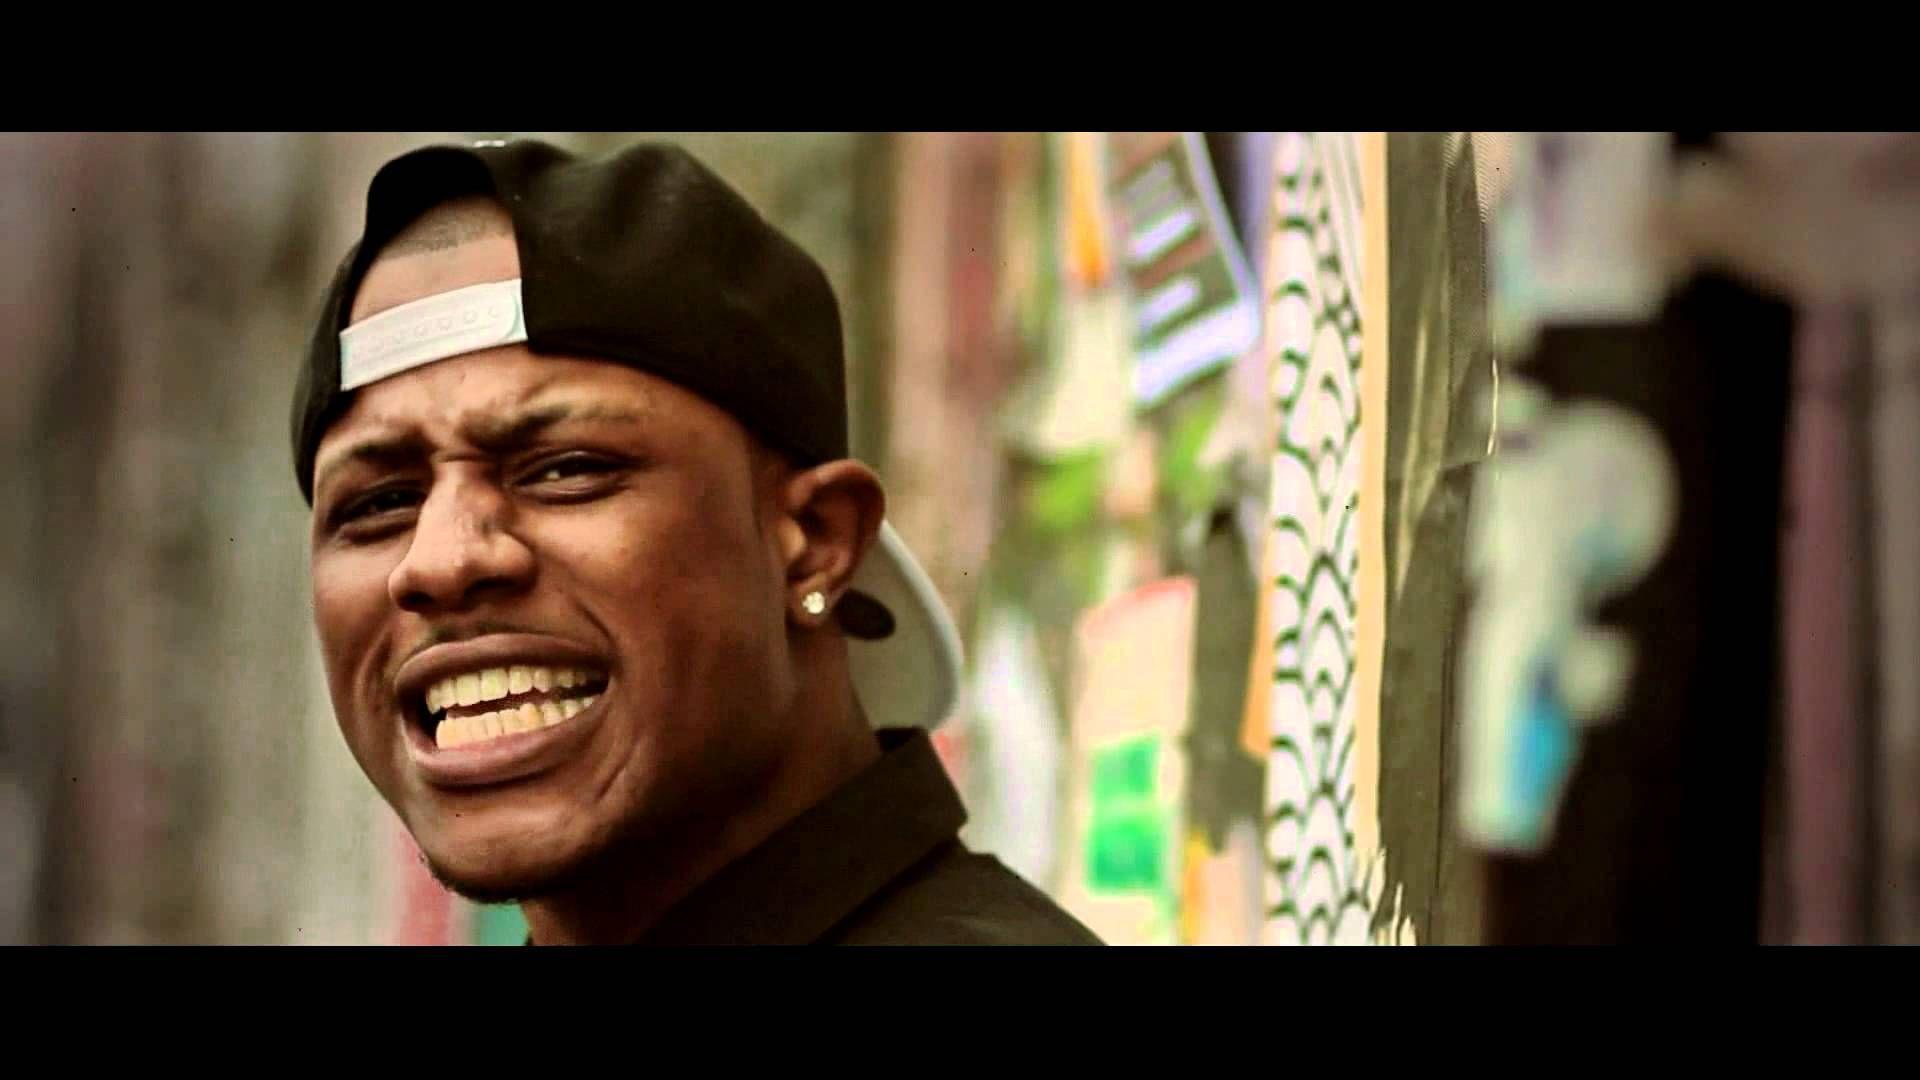 "Shaz Rahman ""Kick in the door"". #Shaz #Rahman #Kikinthedoor #officialvideo #video #rnb #rnbMusic #soul #SoulMusic #music #UKmusic #UKartists #UKrnb #pop #PopMusic #artists #NewMusic #songwriter #singer #song #london #UK #LondonMusic #MusicLover #LateNightLabs #Usher #NeYo #dreads #dreadlove #dreads #locks #BlackIsBeautiful #dance #dancing #dancer #UKrap"